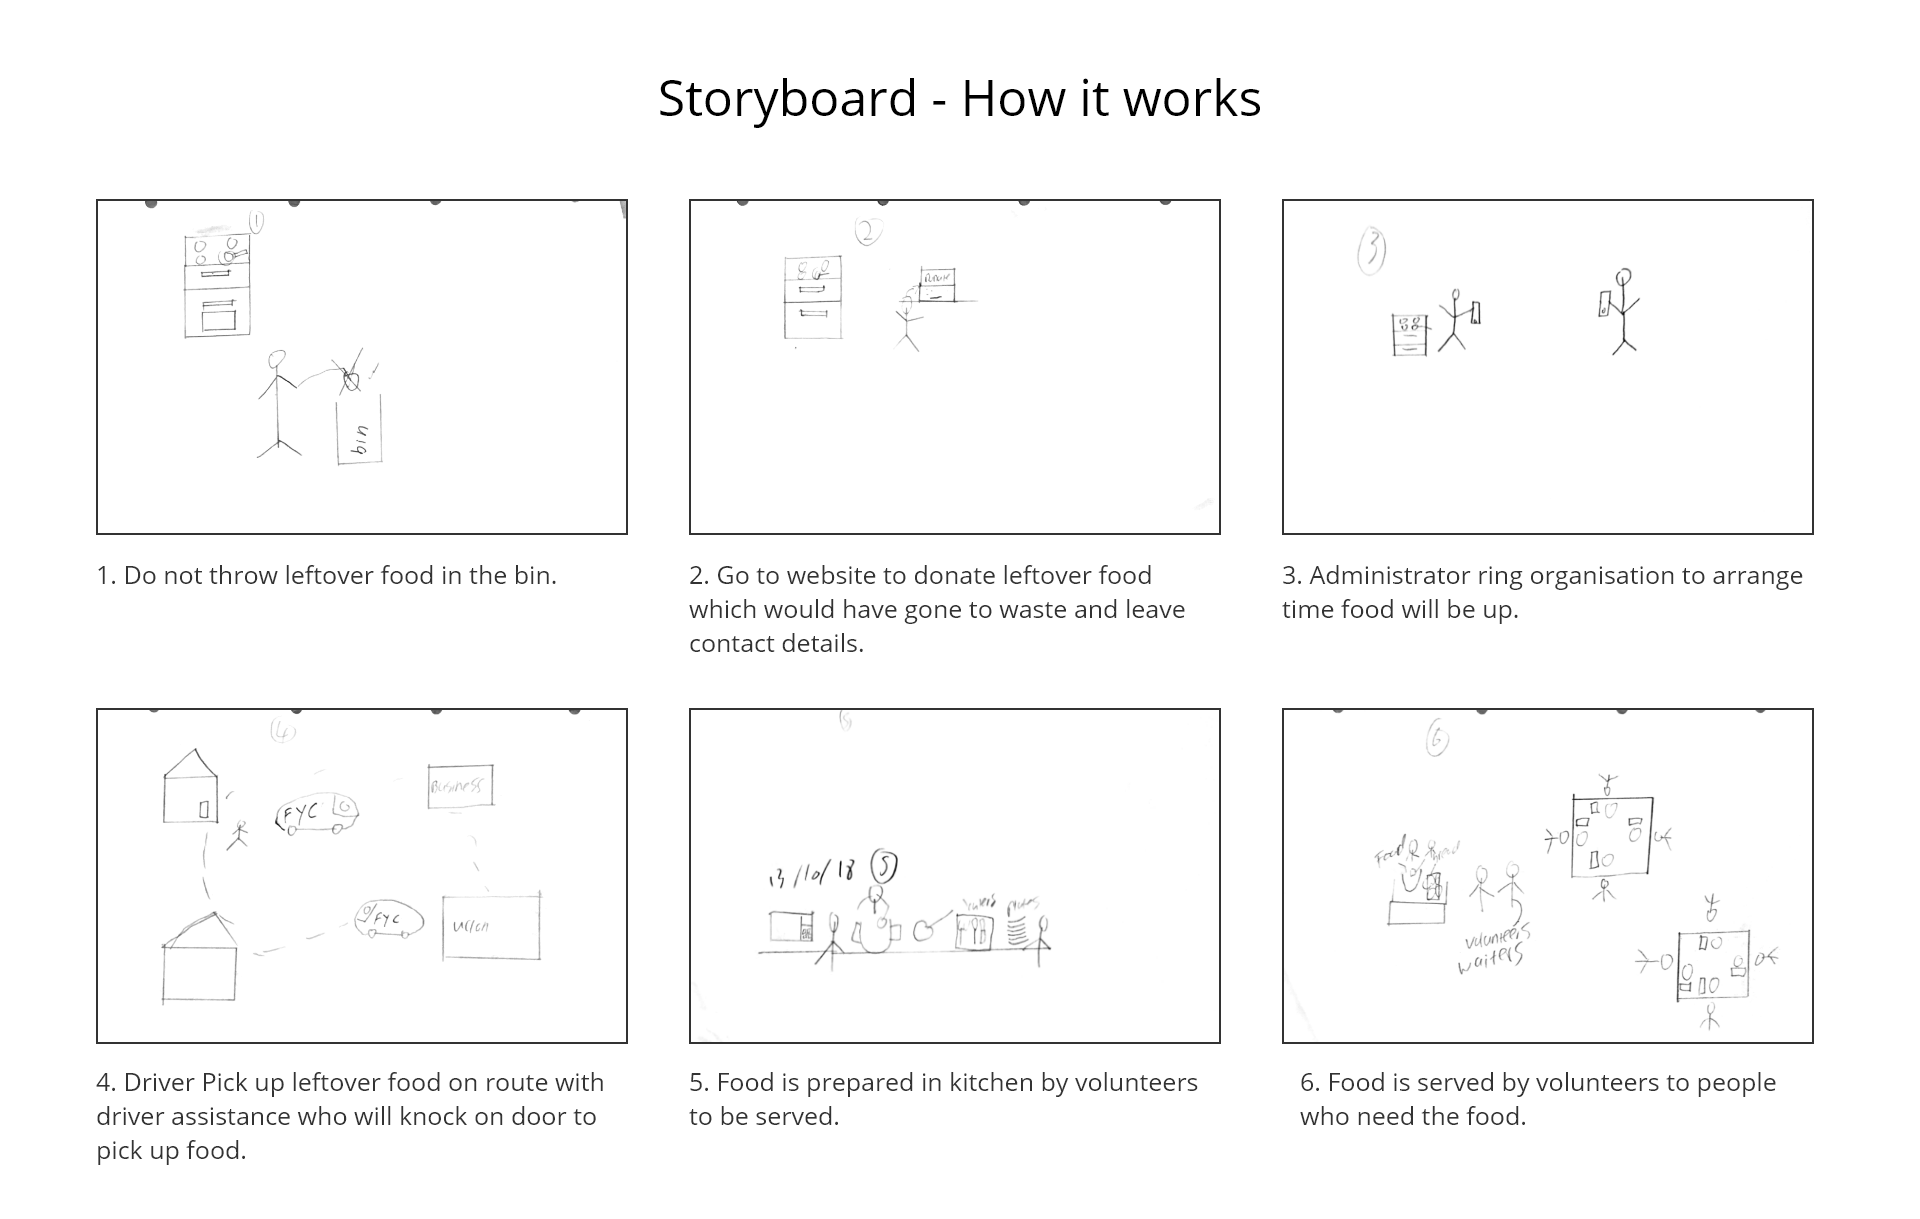 FYD storyboard